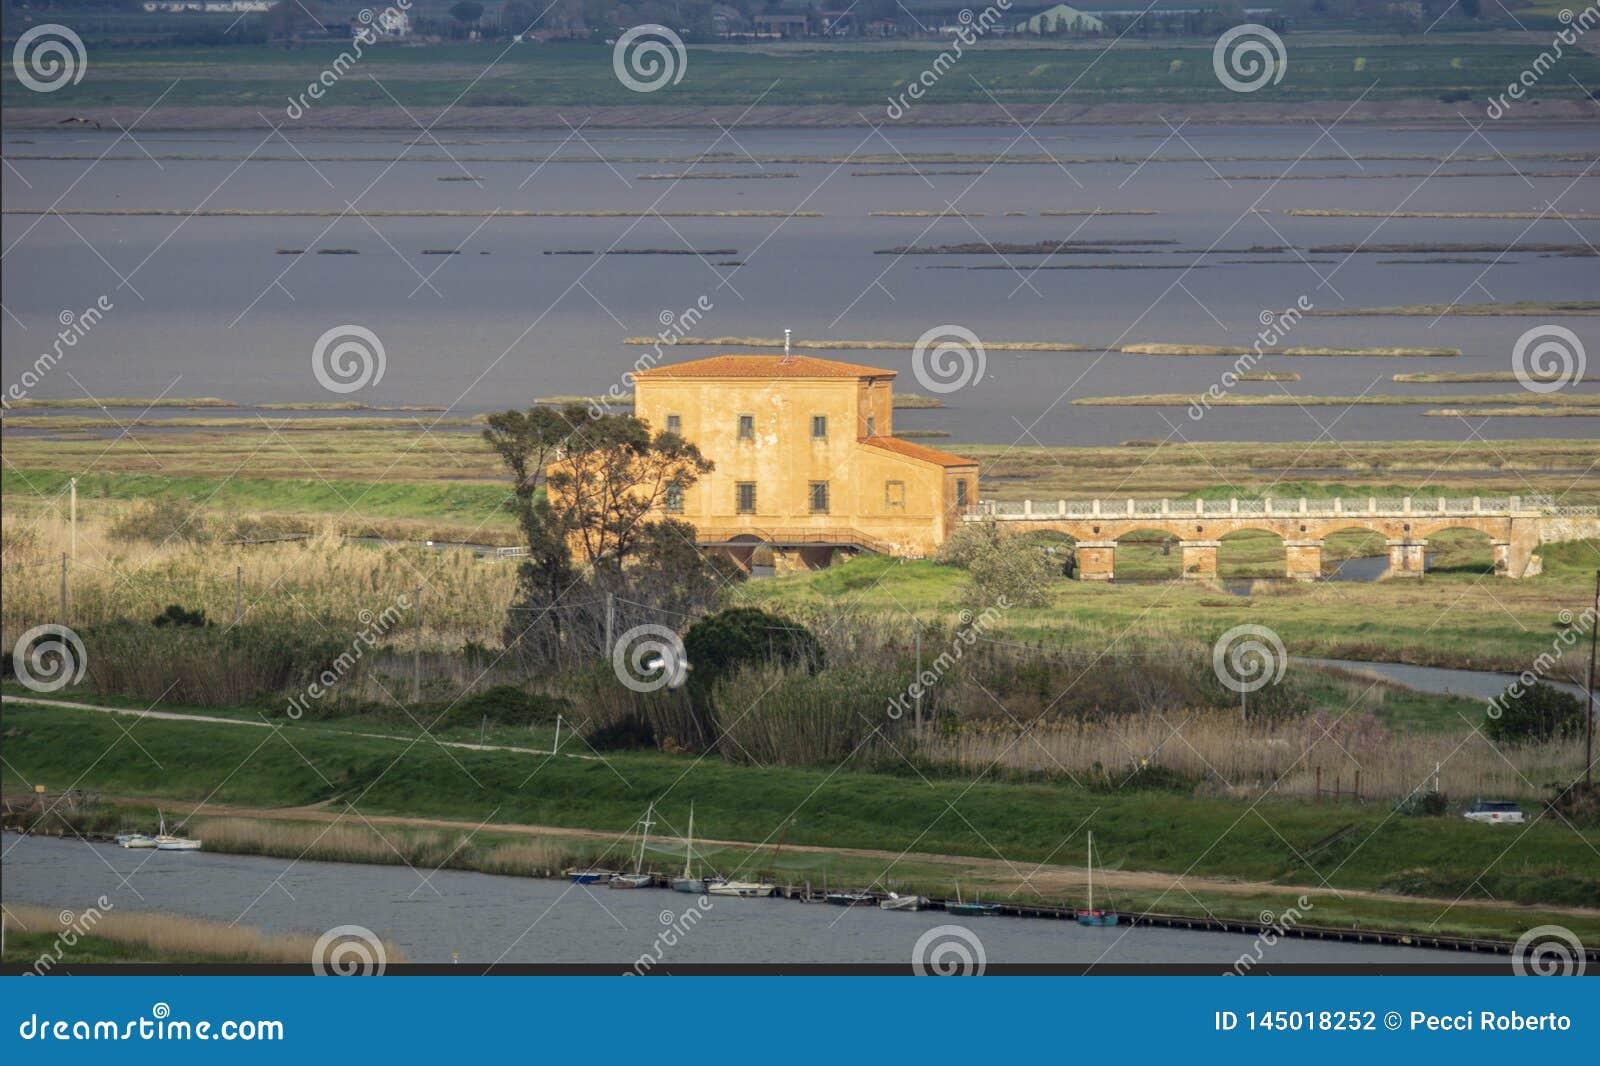 Italia, Toscana, della Pescaia, vista de Castiglione de la reserva de naturaleza de Diaccia Botrona desde arriba